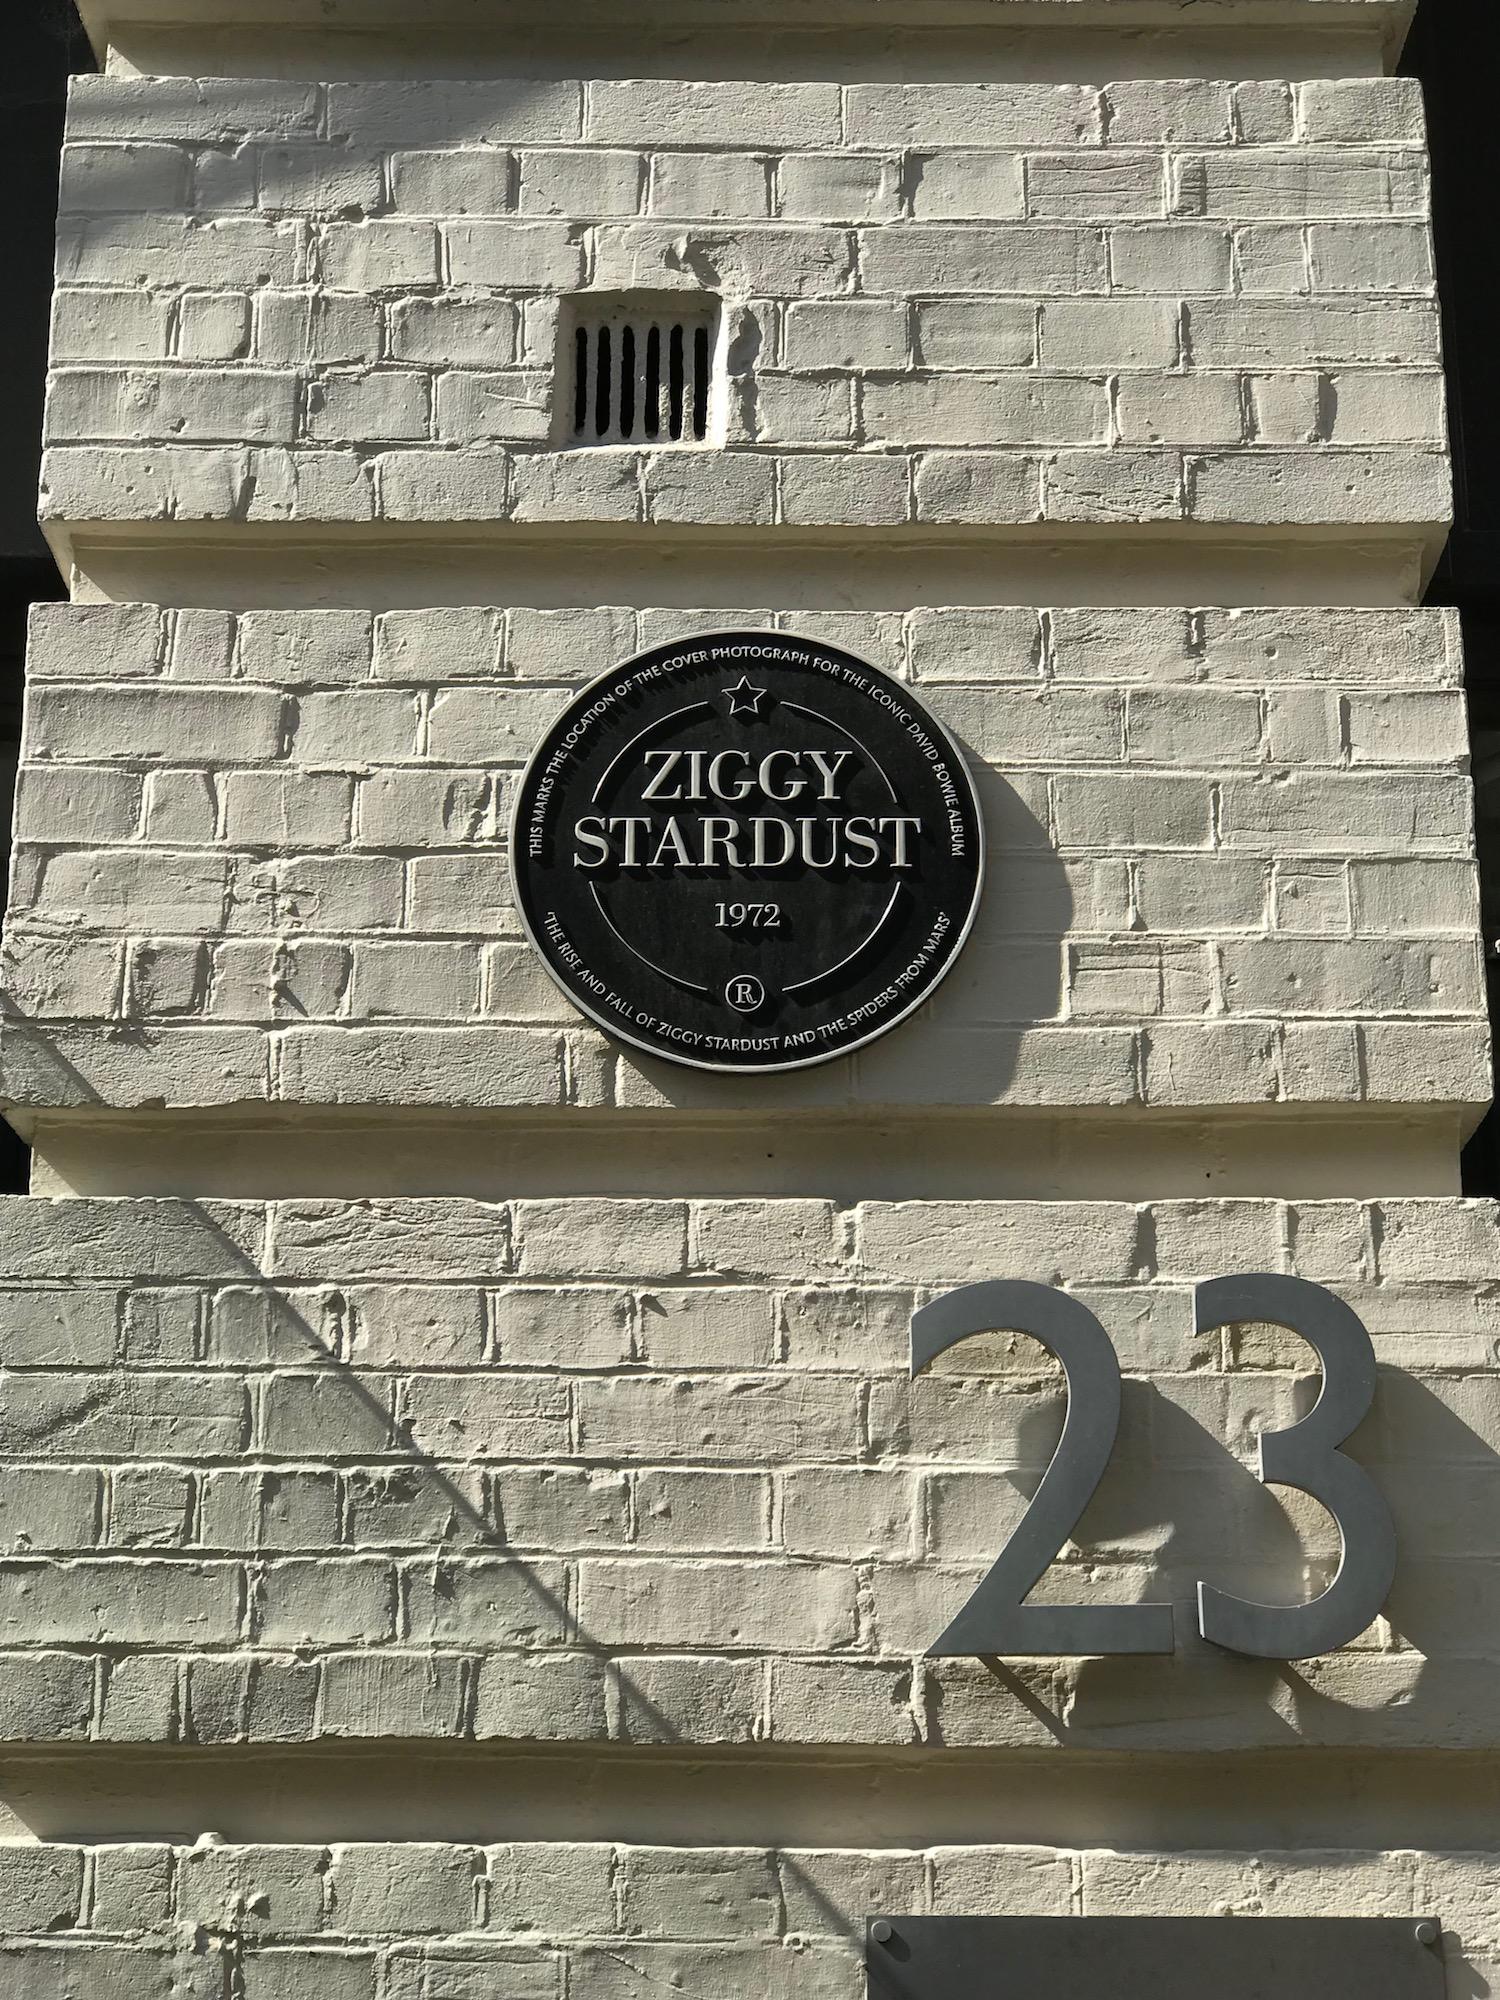 Ziggy Stardust 1972 Site of Album Cover Shoot. .jpg